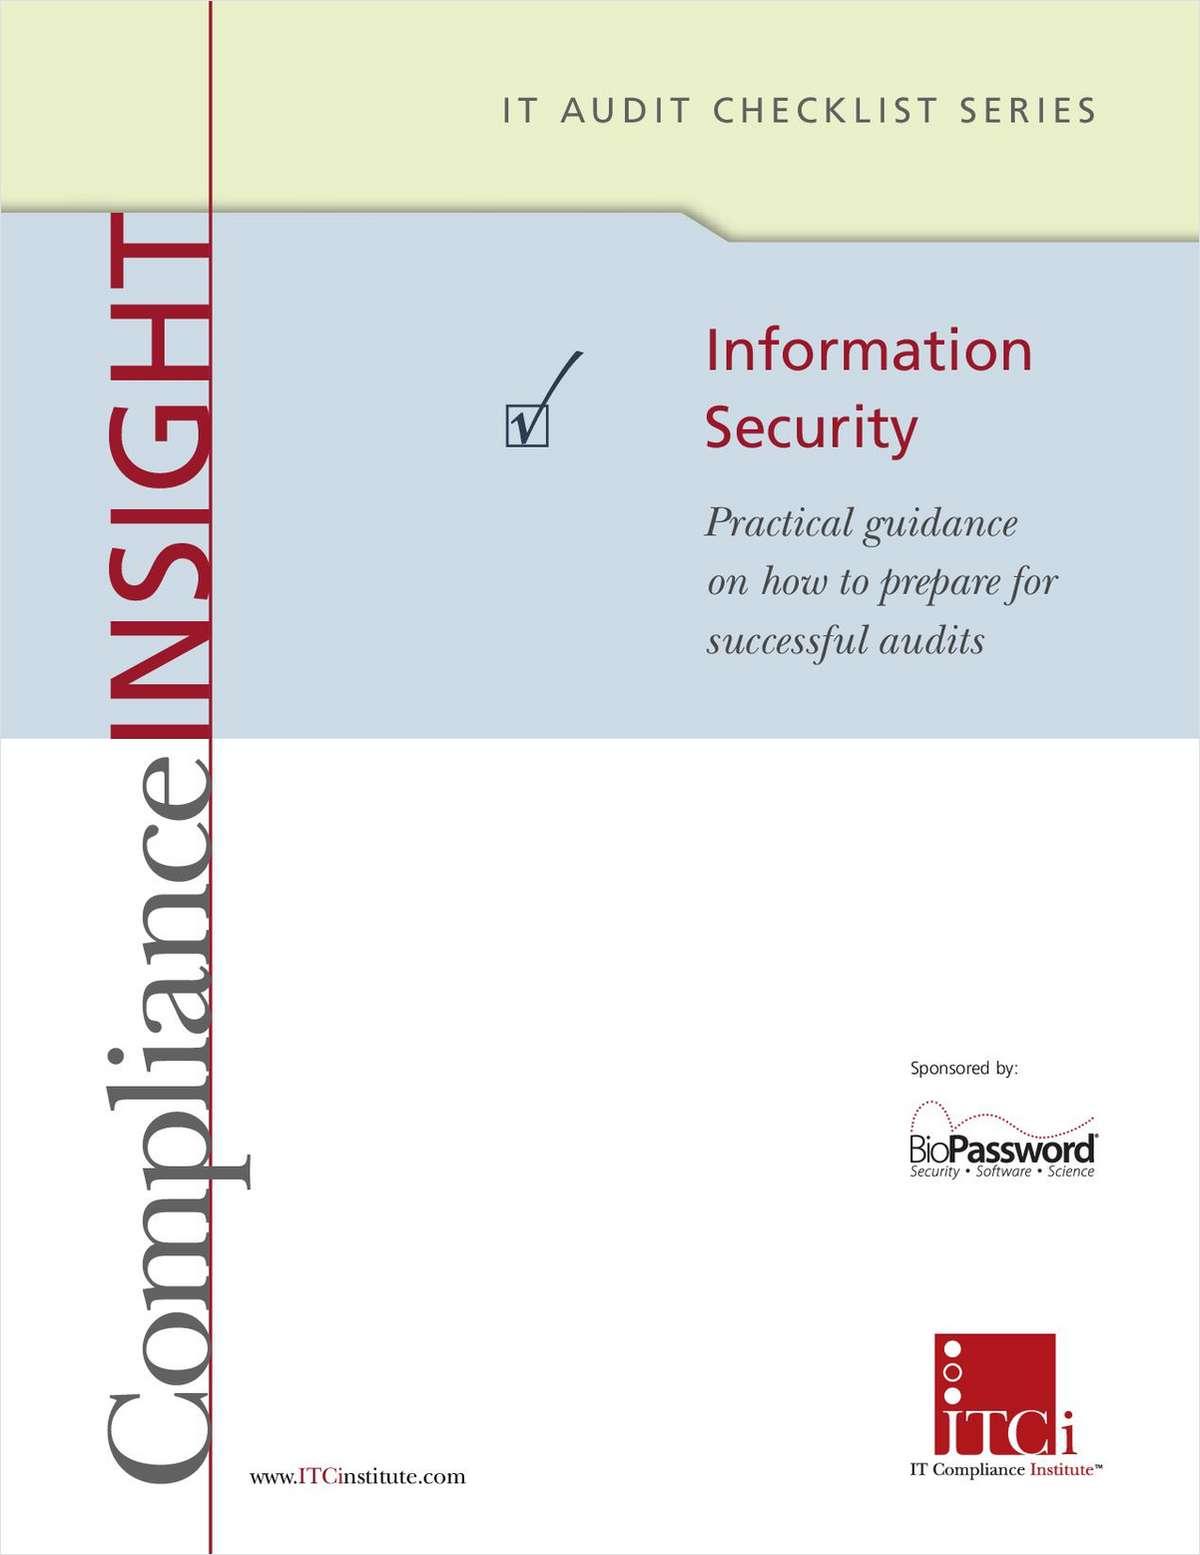 IT Audit Checklist: Information Security